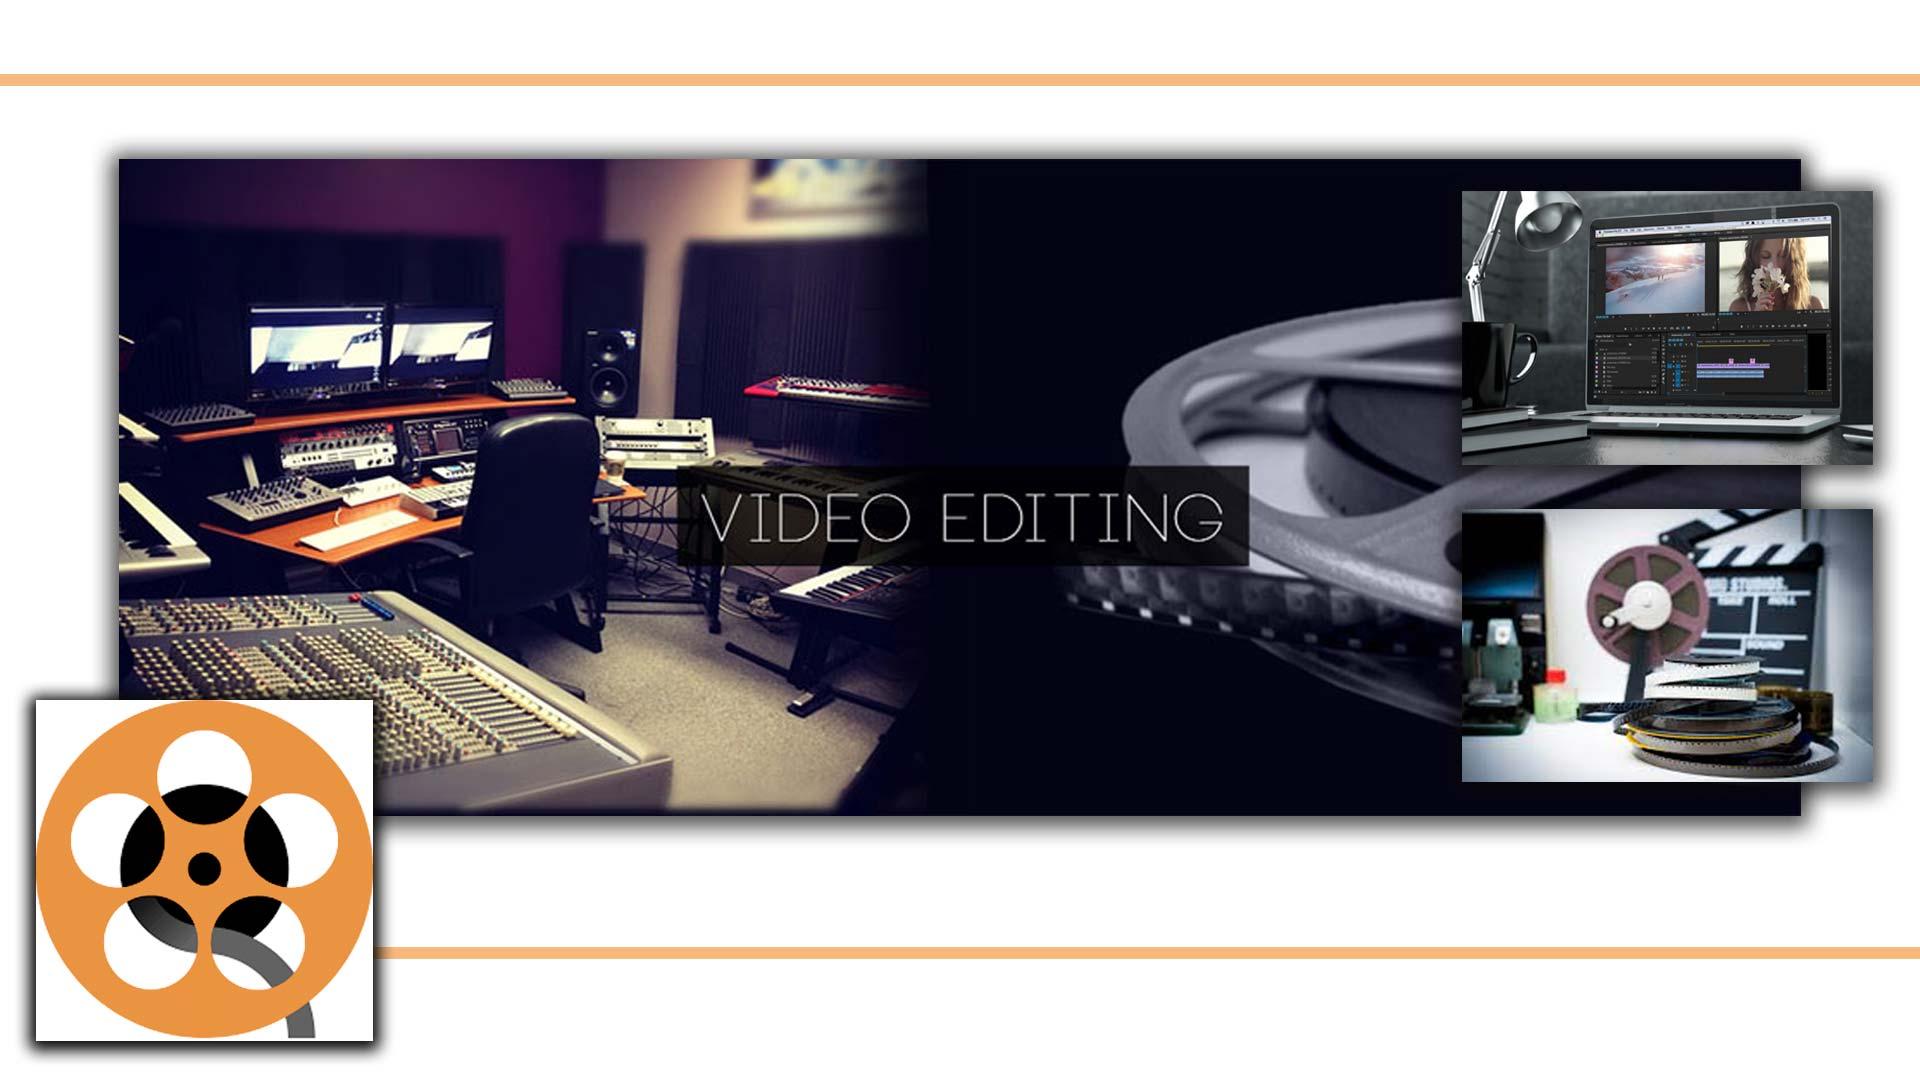 Cuts Every Editor  5 1 - انواع برش در تدوین : 12 کات (برش) ضروری که هر تدوینگر باید بداند